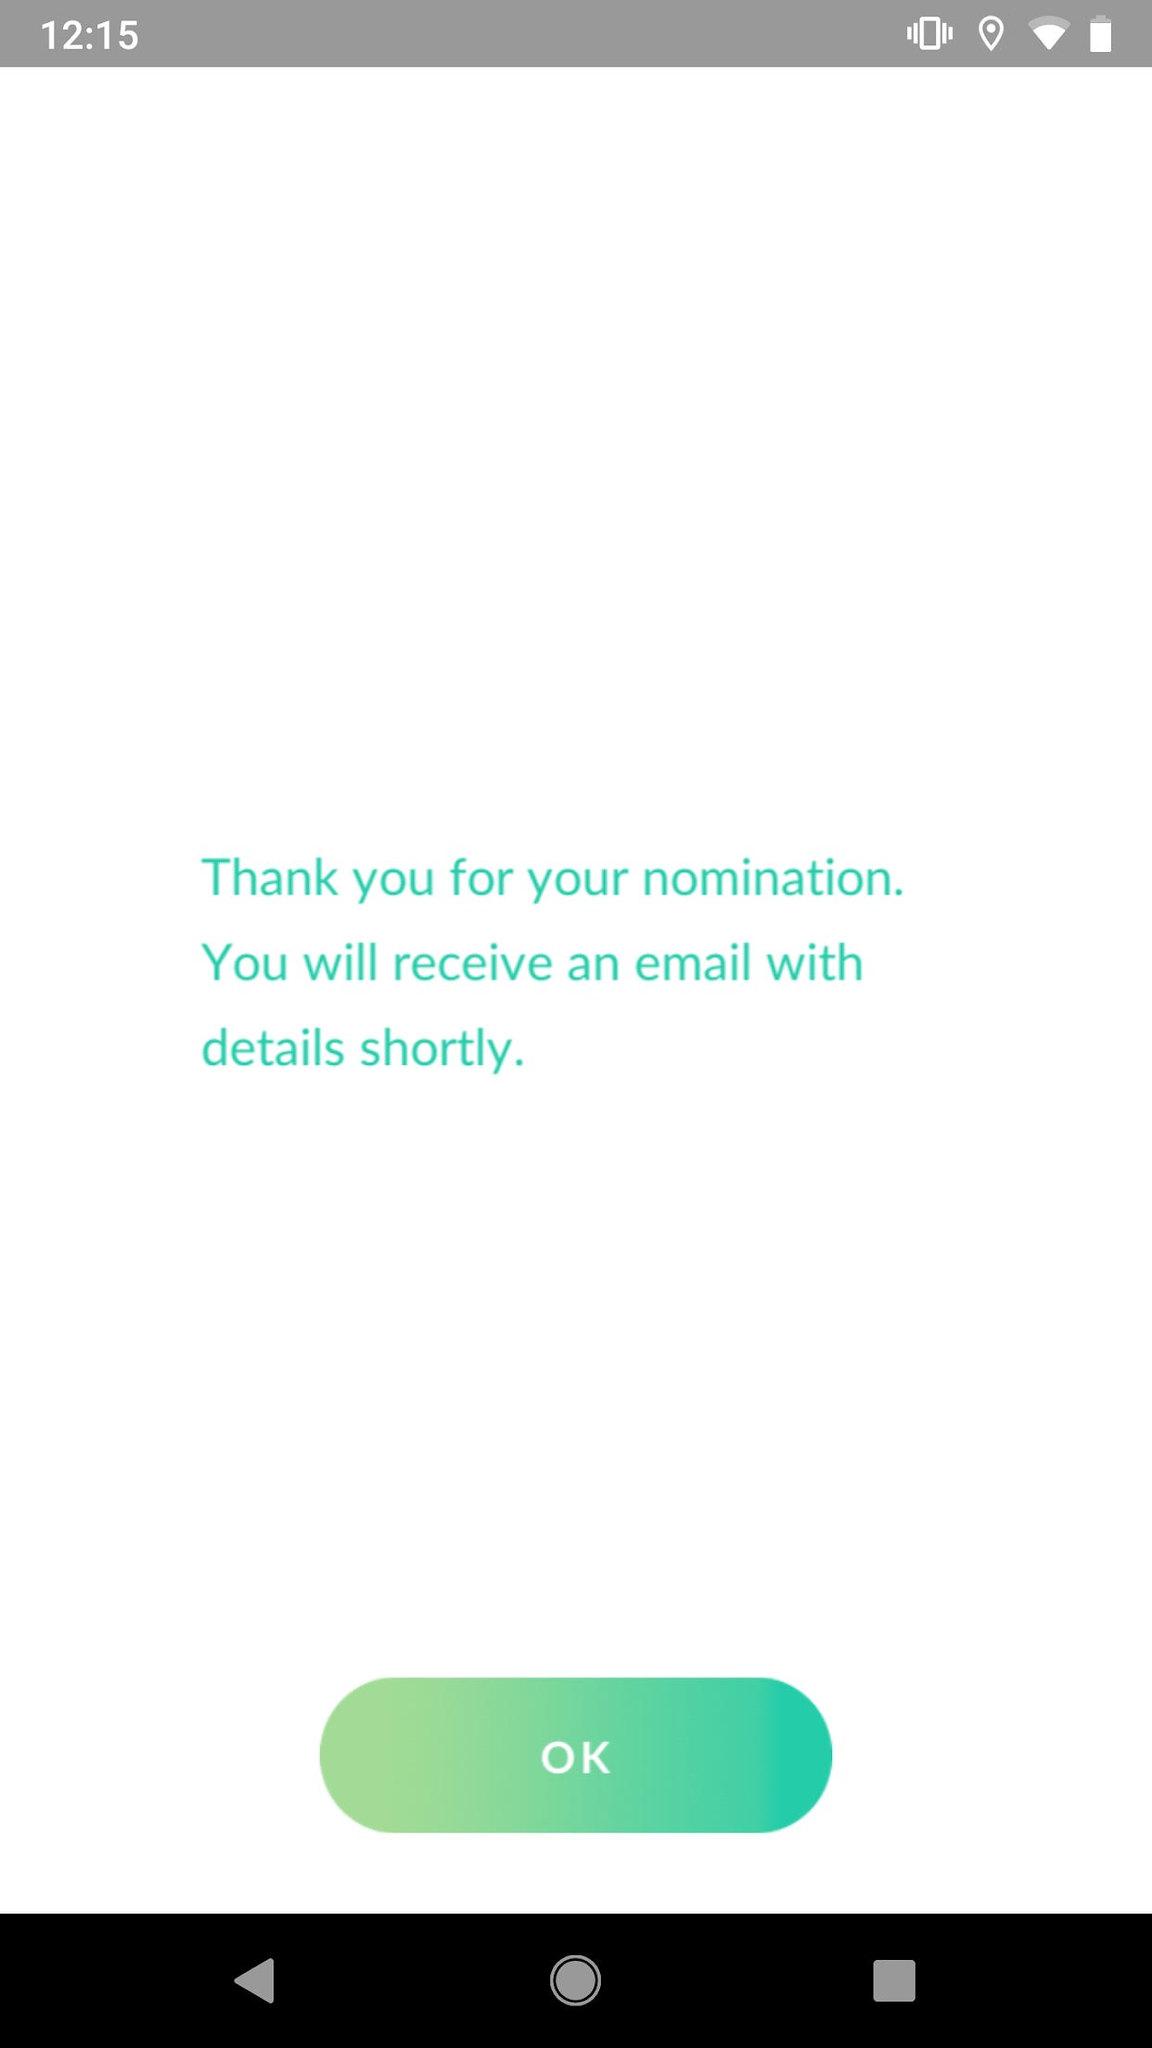 pokemon_go_pokestop_nomination_feature_screenshot_2